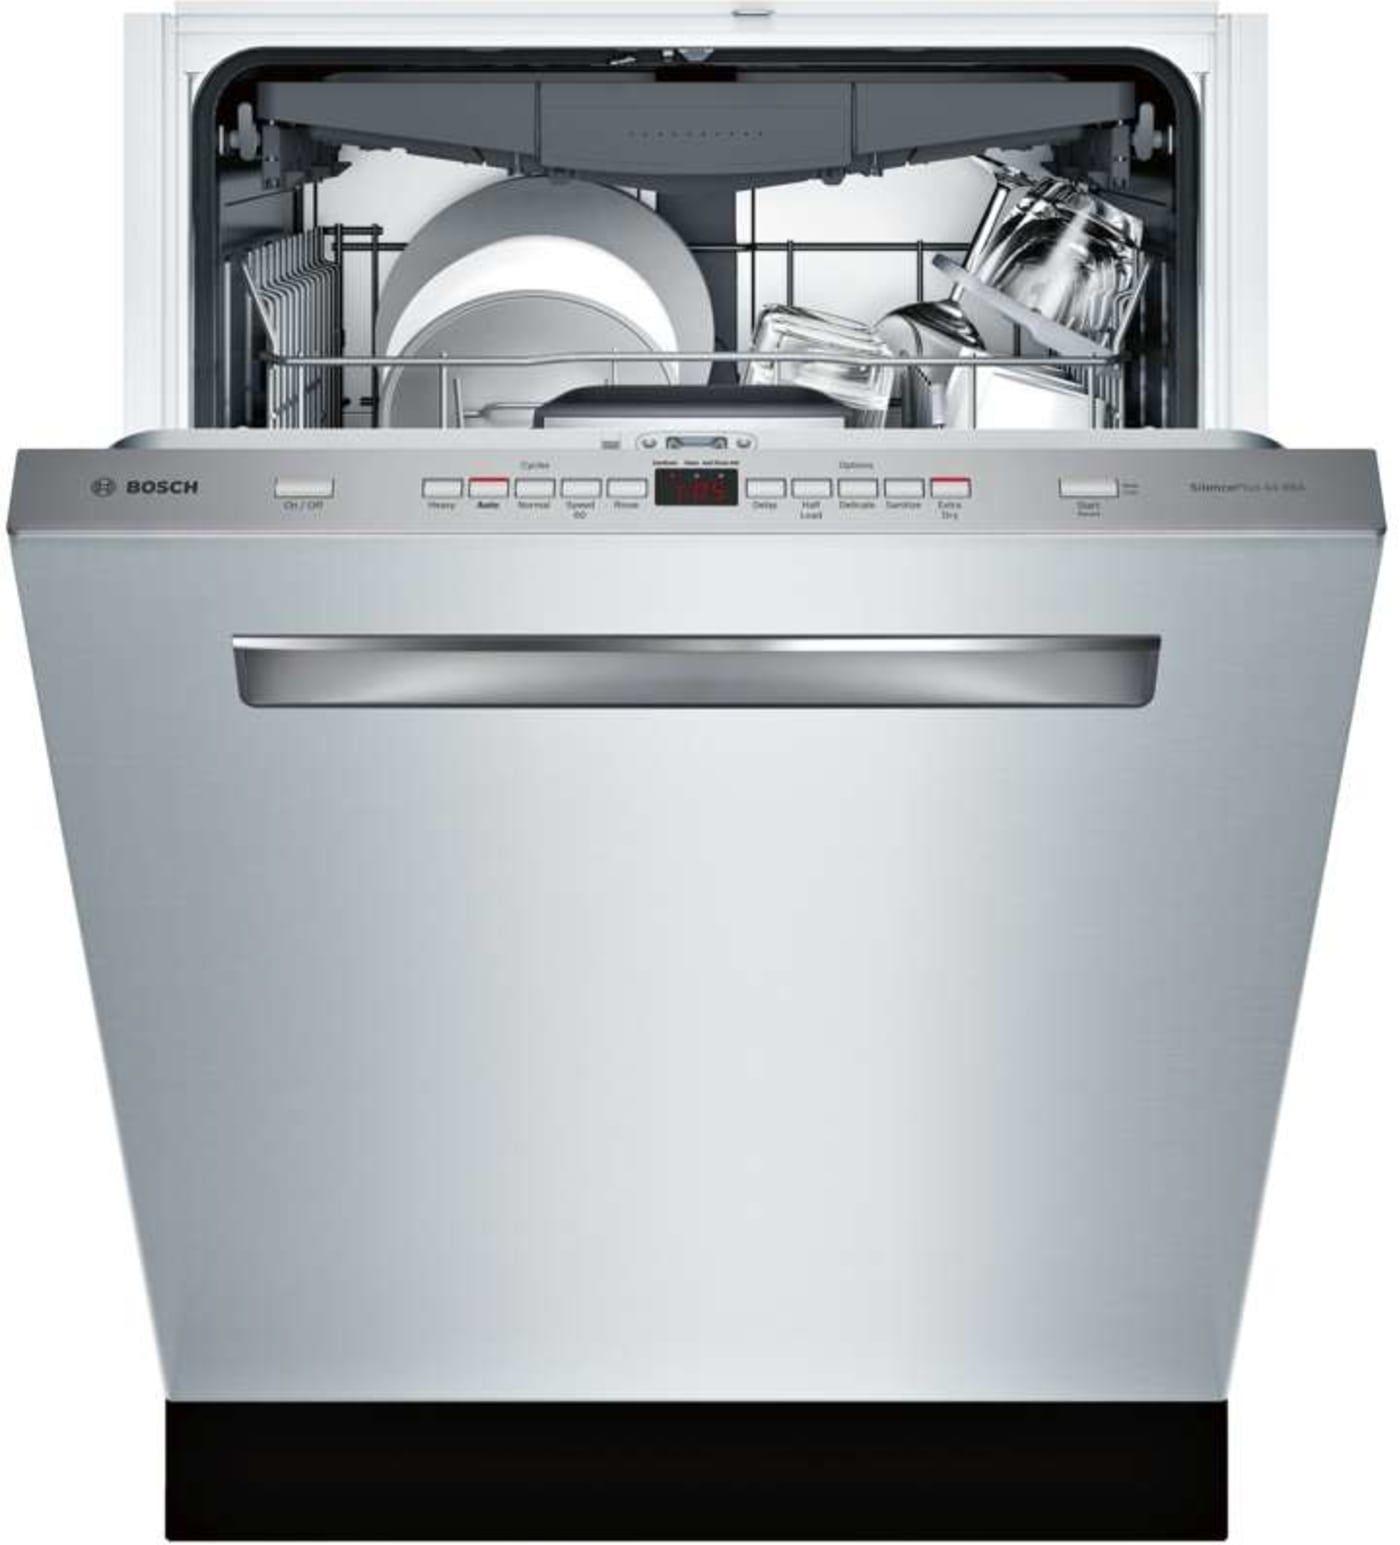 Bosch Shpm65w55n Hot Sellers In 2019 Built In Dishwasher